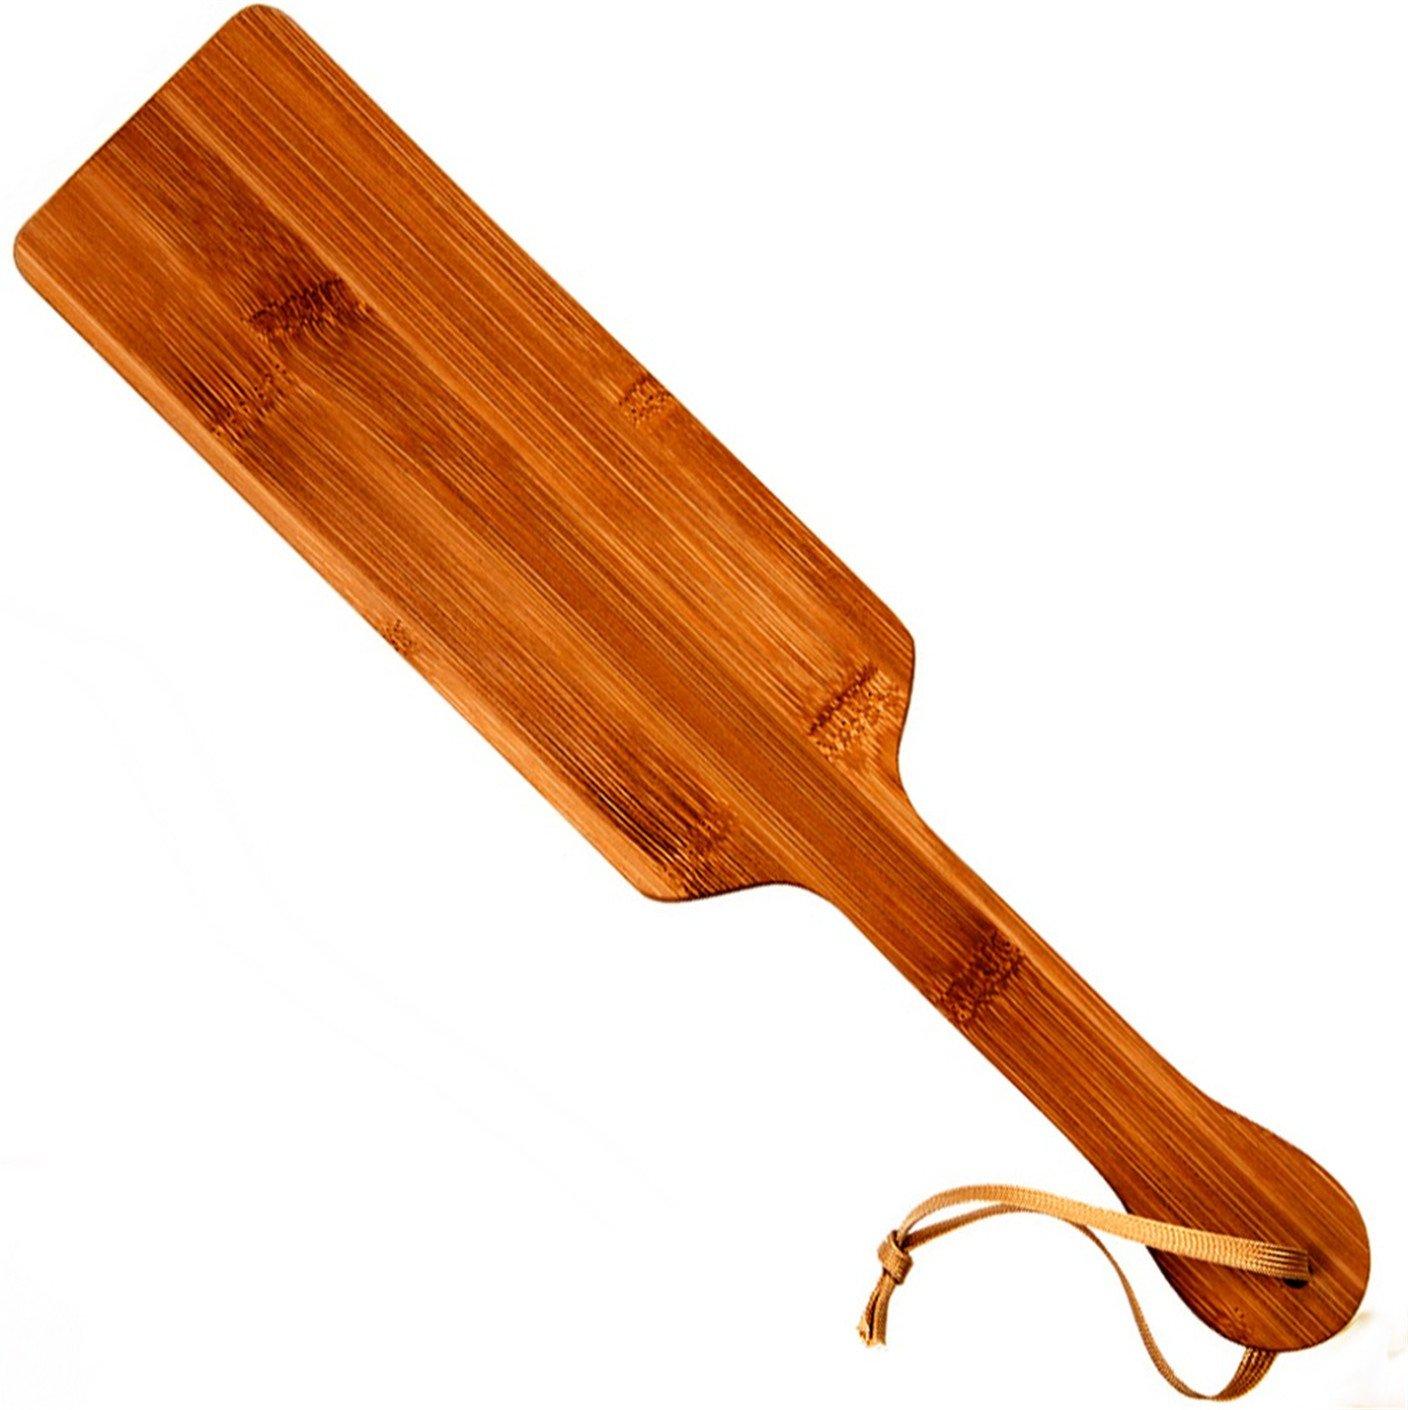 Adult SM Game Sex Wood Spanking Paddle Print Natural Bamboo clap Slap Flap Pat Beat Whip lash flog Ass Toy